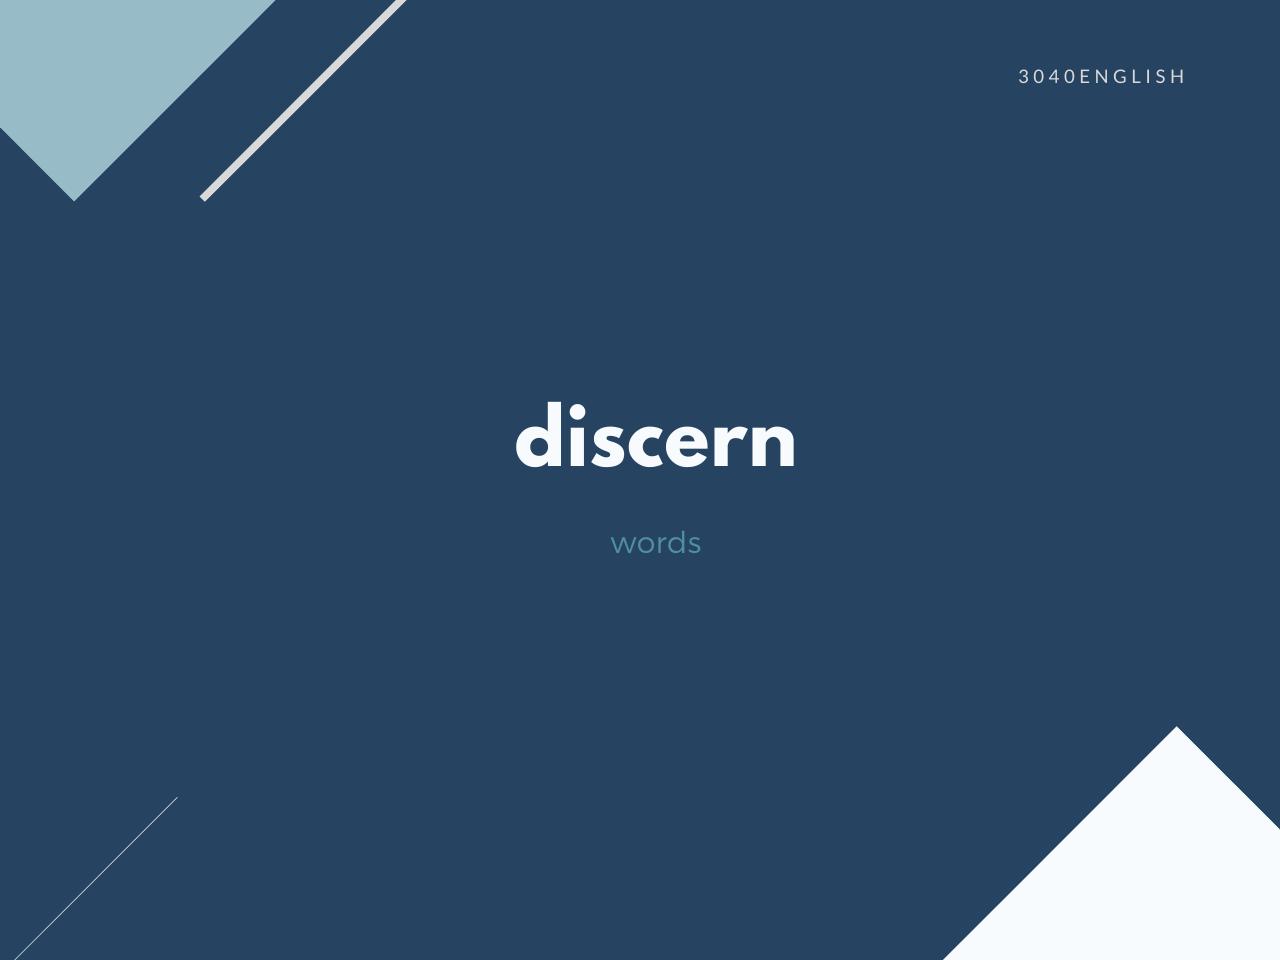 discern の意味と簡単な使い方【音読用例文あり】